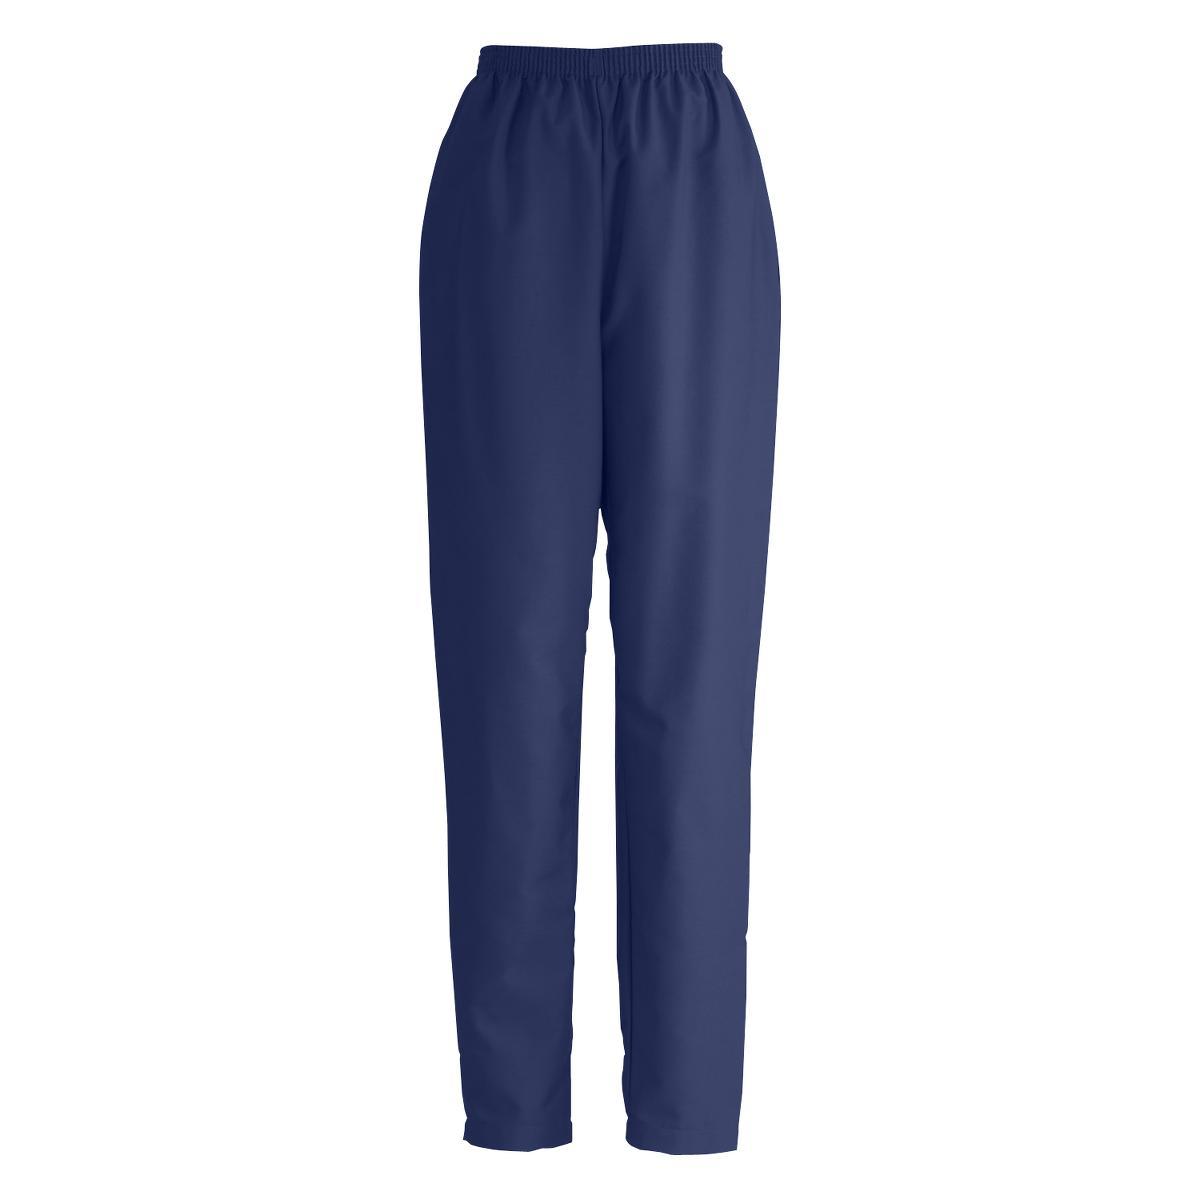 ComfortEase Elastic Waist Two-Pocket Petite Scrub Pants